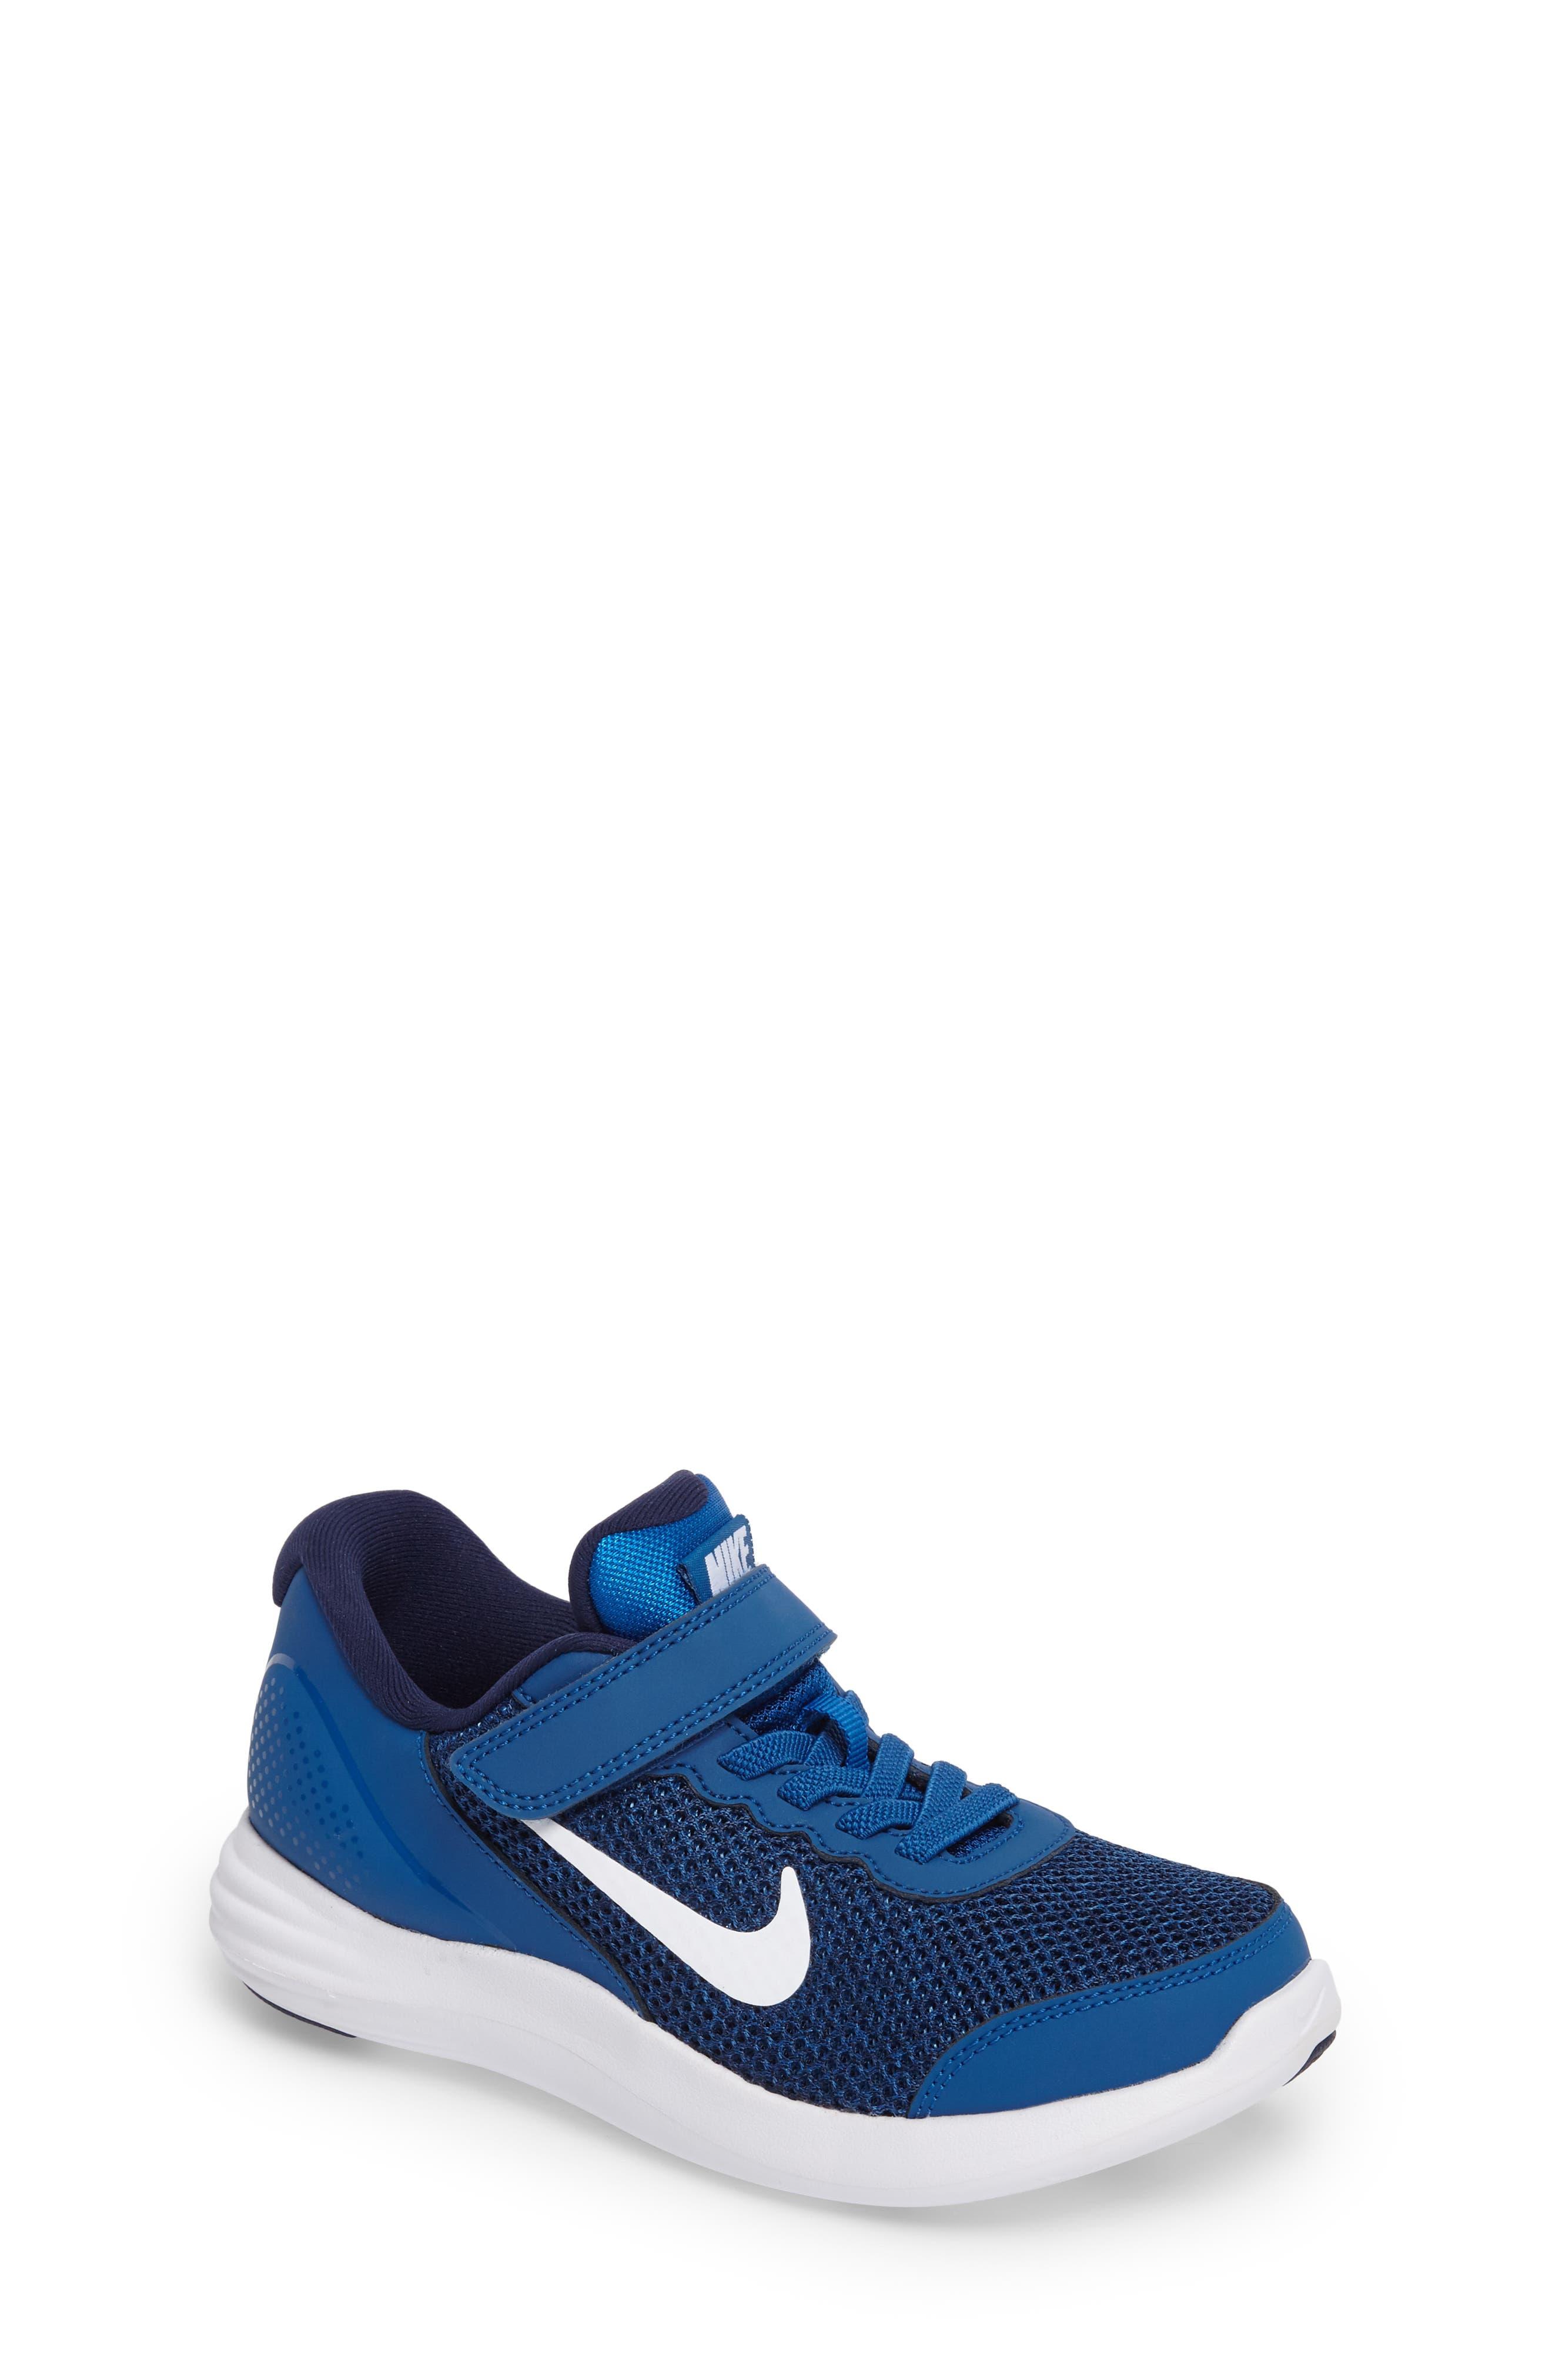 Lunar Apparent Sneaker,                         Main,                         color, Blue Jay/ White/ Binary Blue